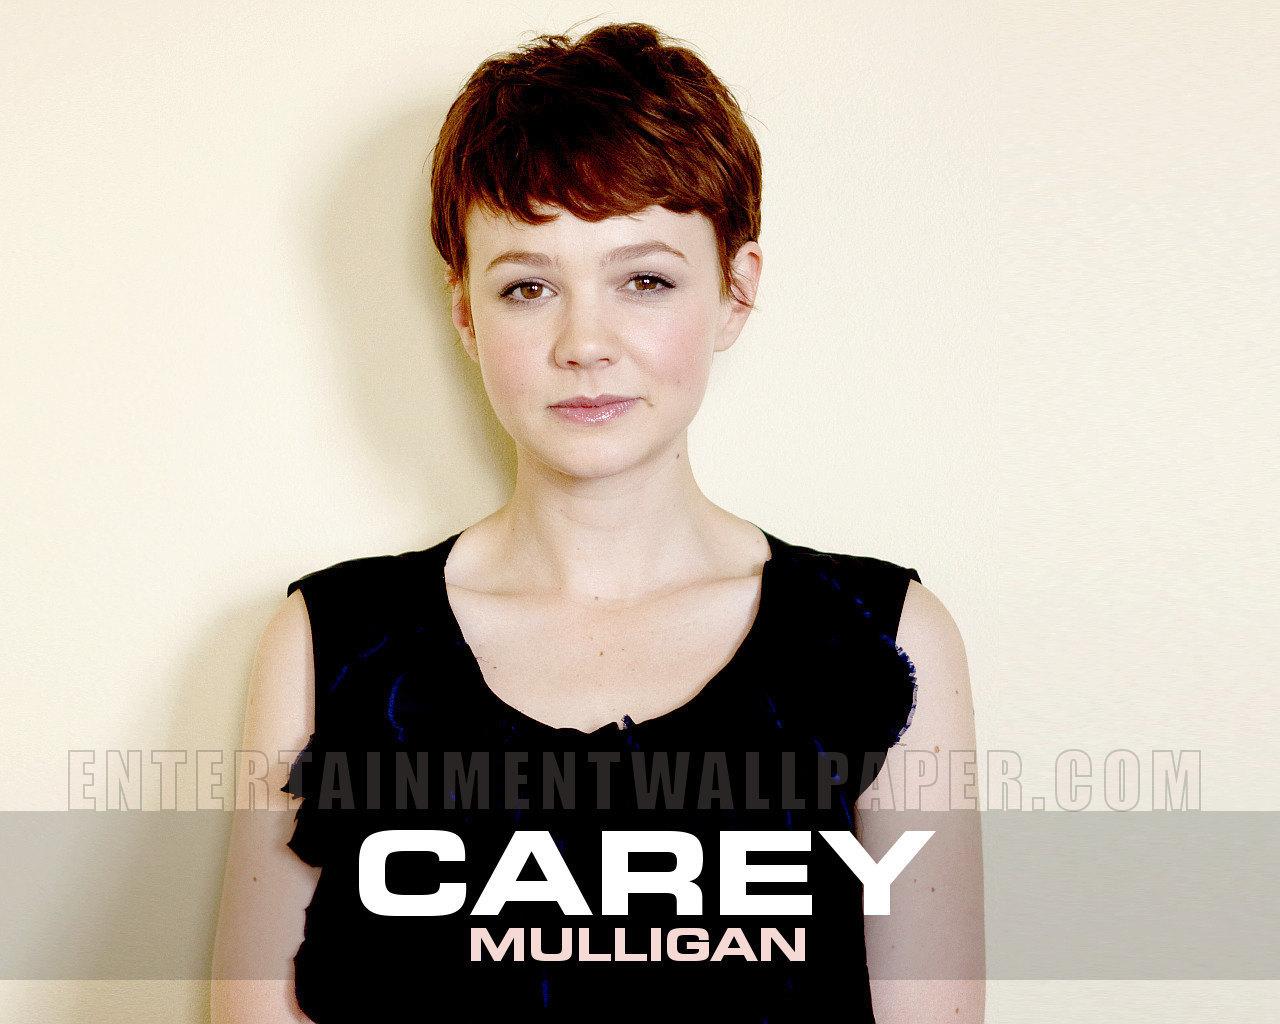 Carey Mulligan - Carey Mulligan Wallpaper (15276269) - Fanpop Carey Mulligan